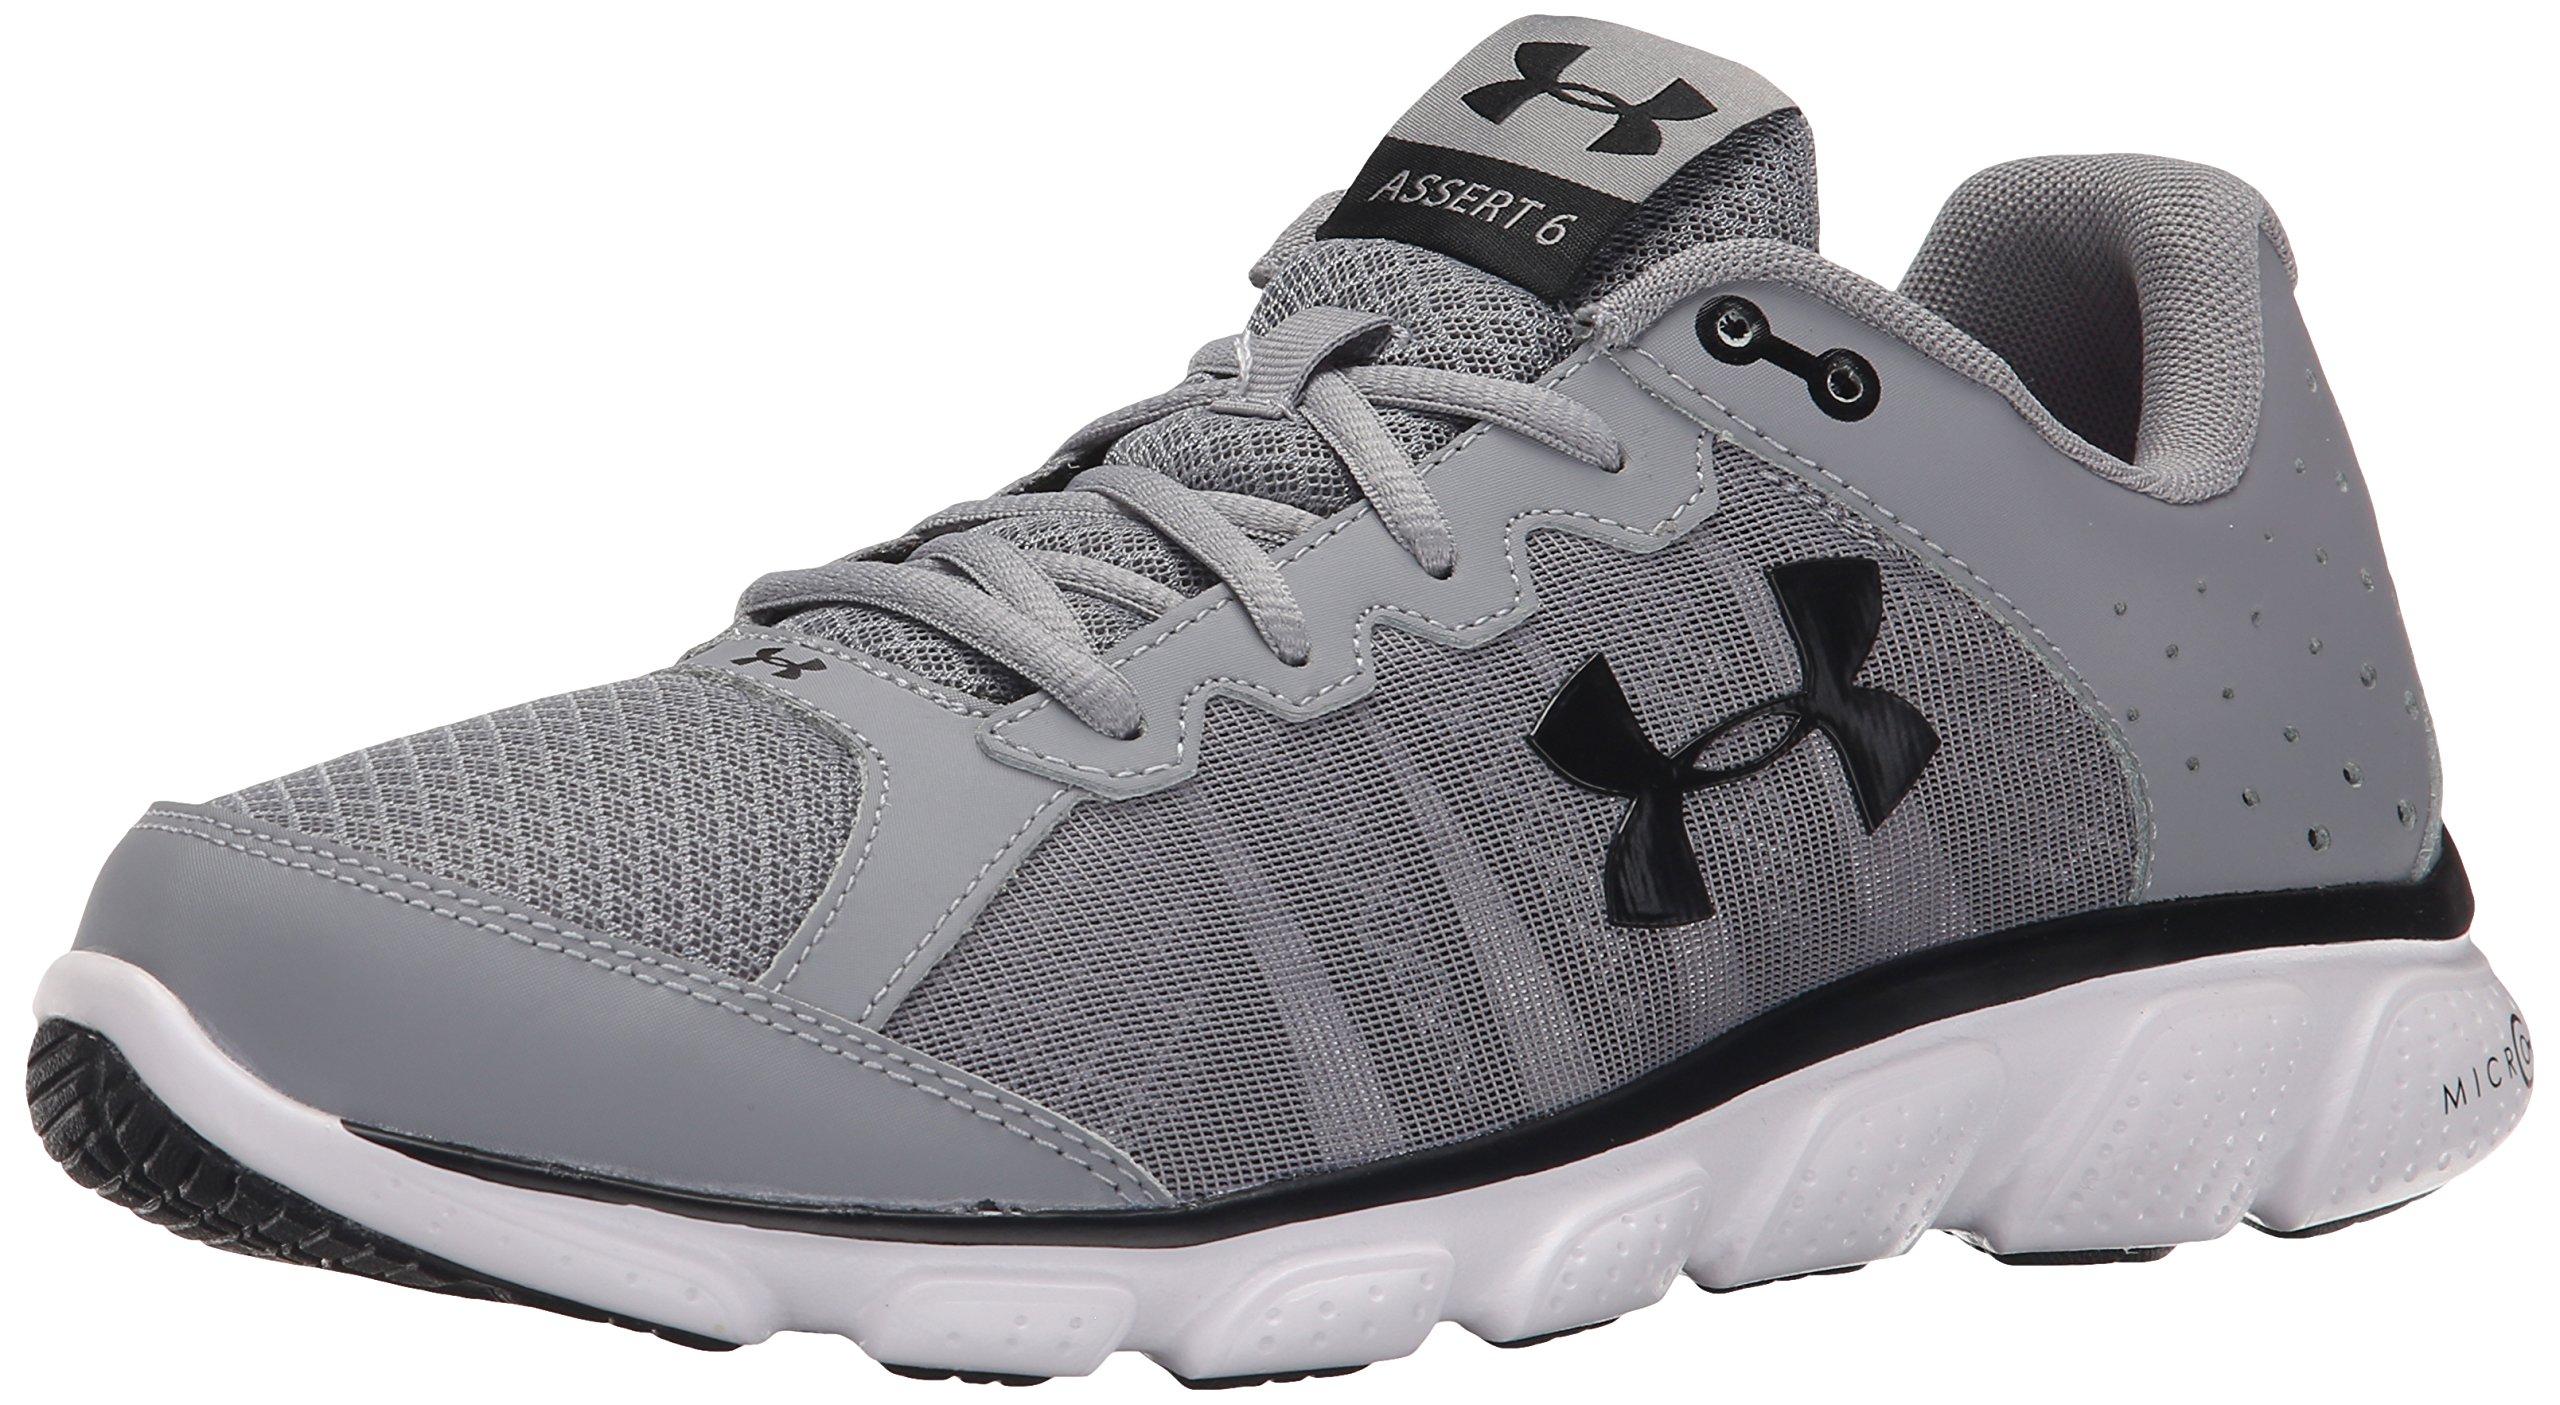 Under Armour Men's Micro G Assert 6 Running Shoe Steel (036)/White 7.5